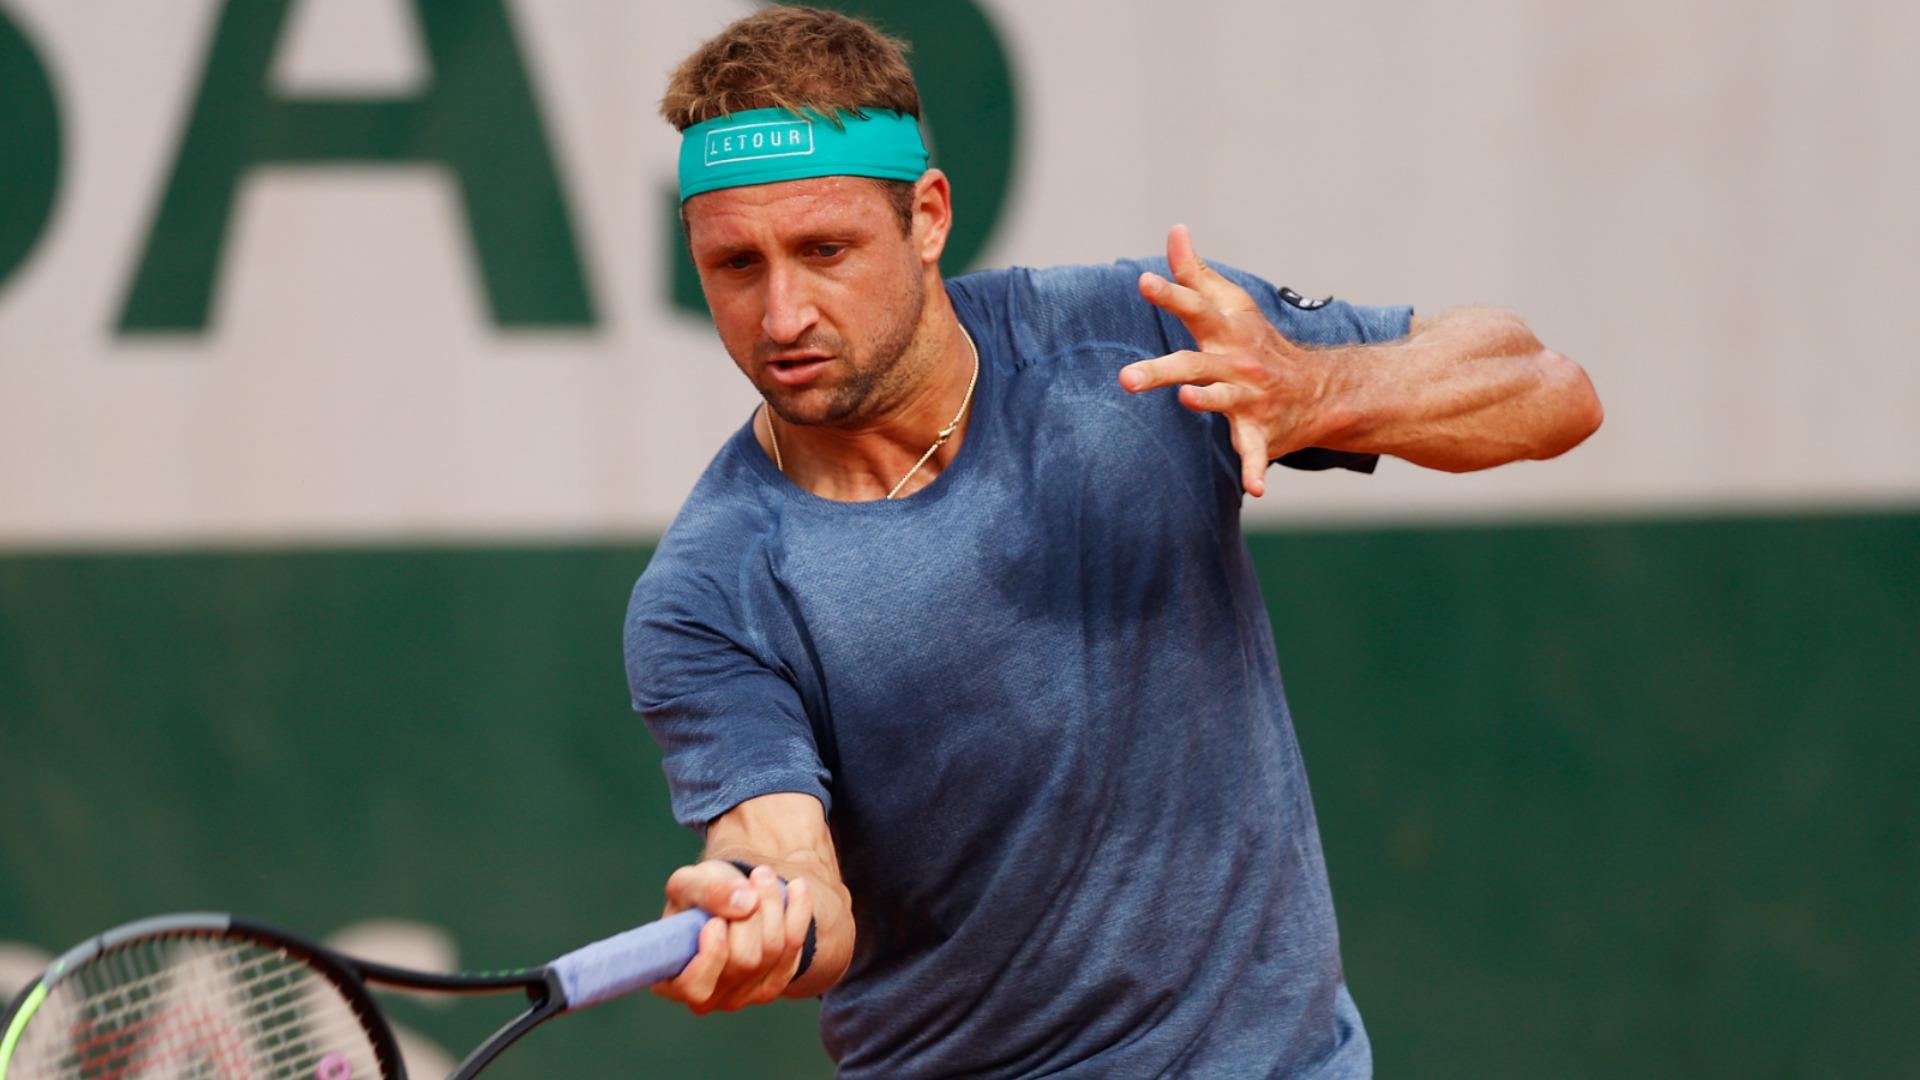 Sandgren cleared to travel to Australian Open despite positive COVID-19 test